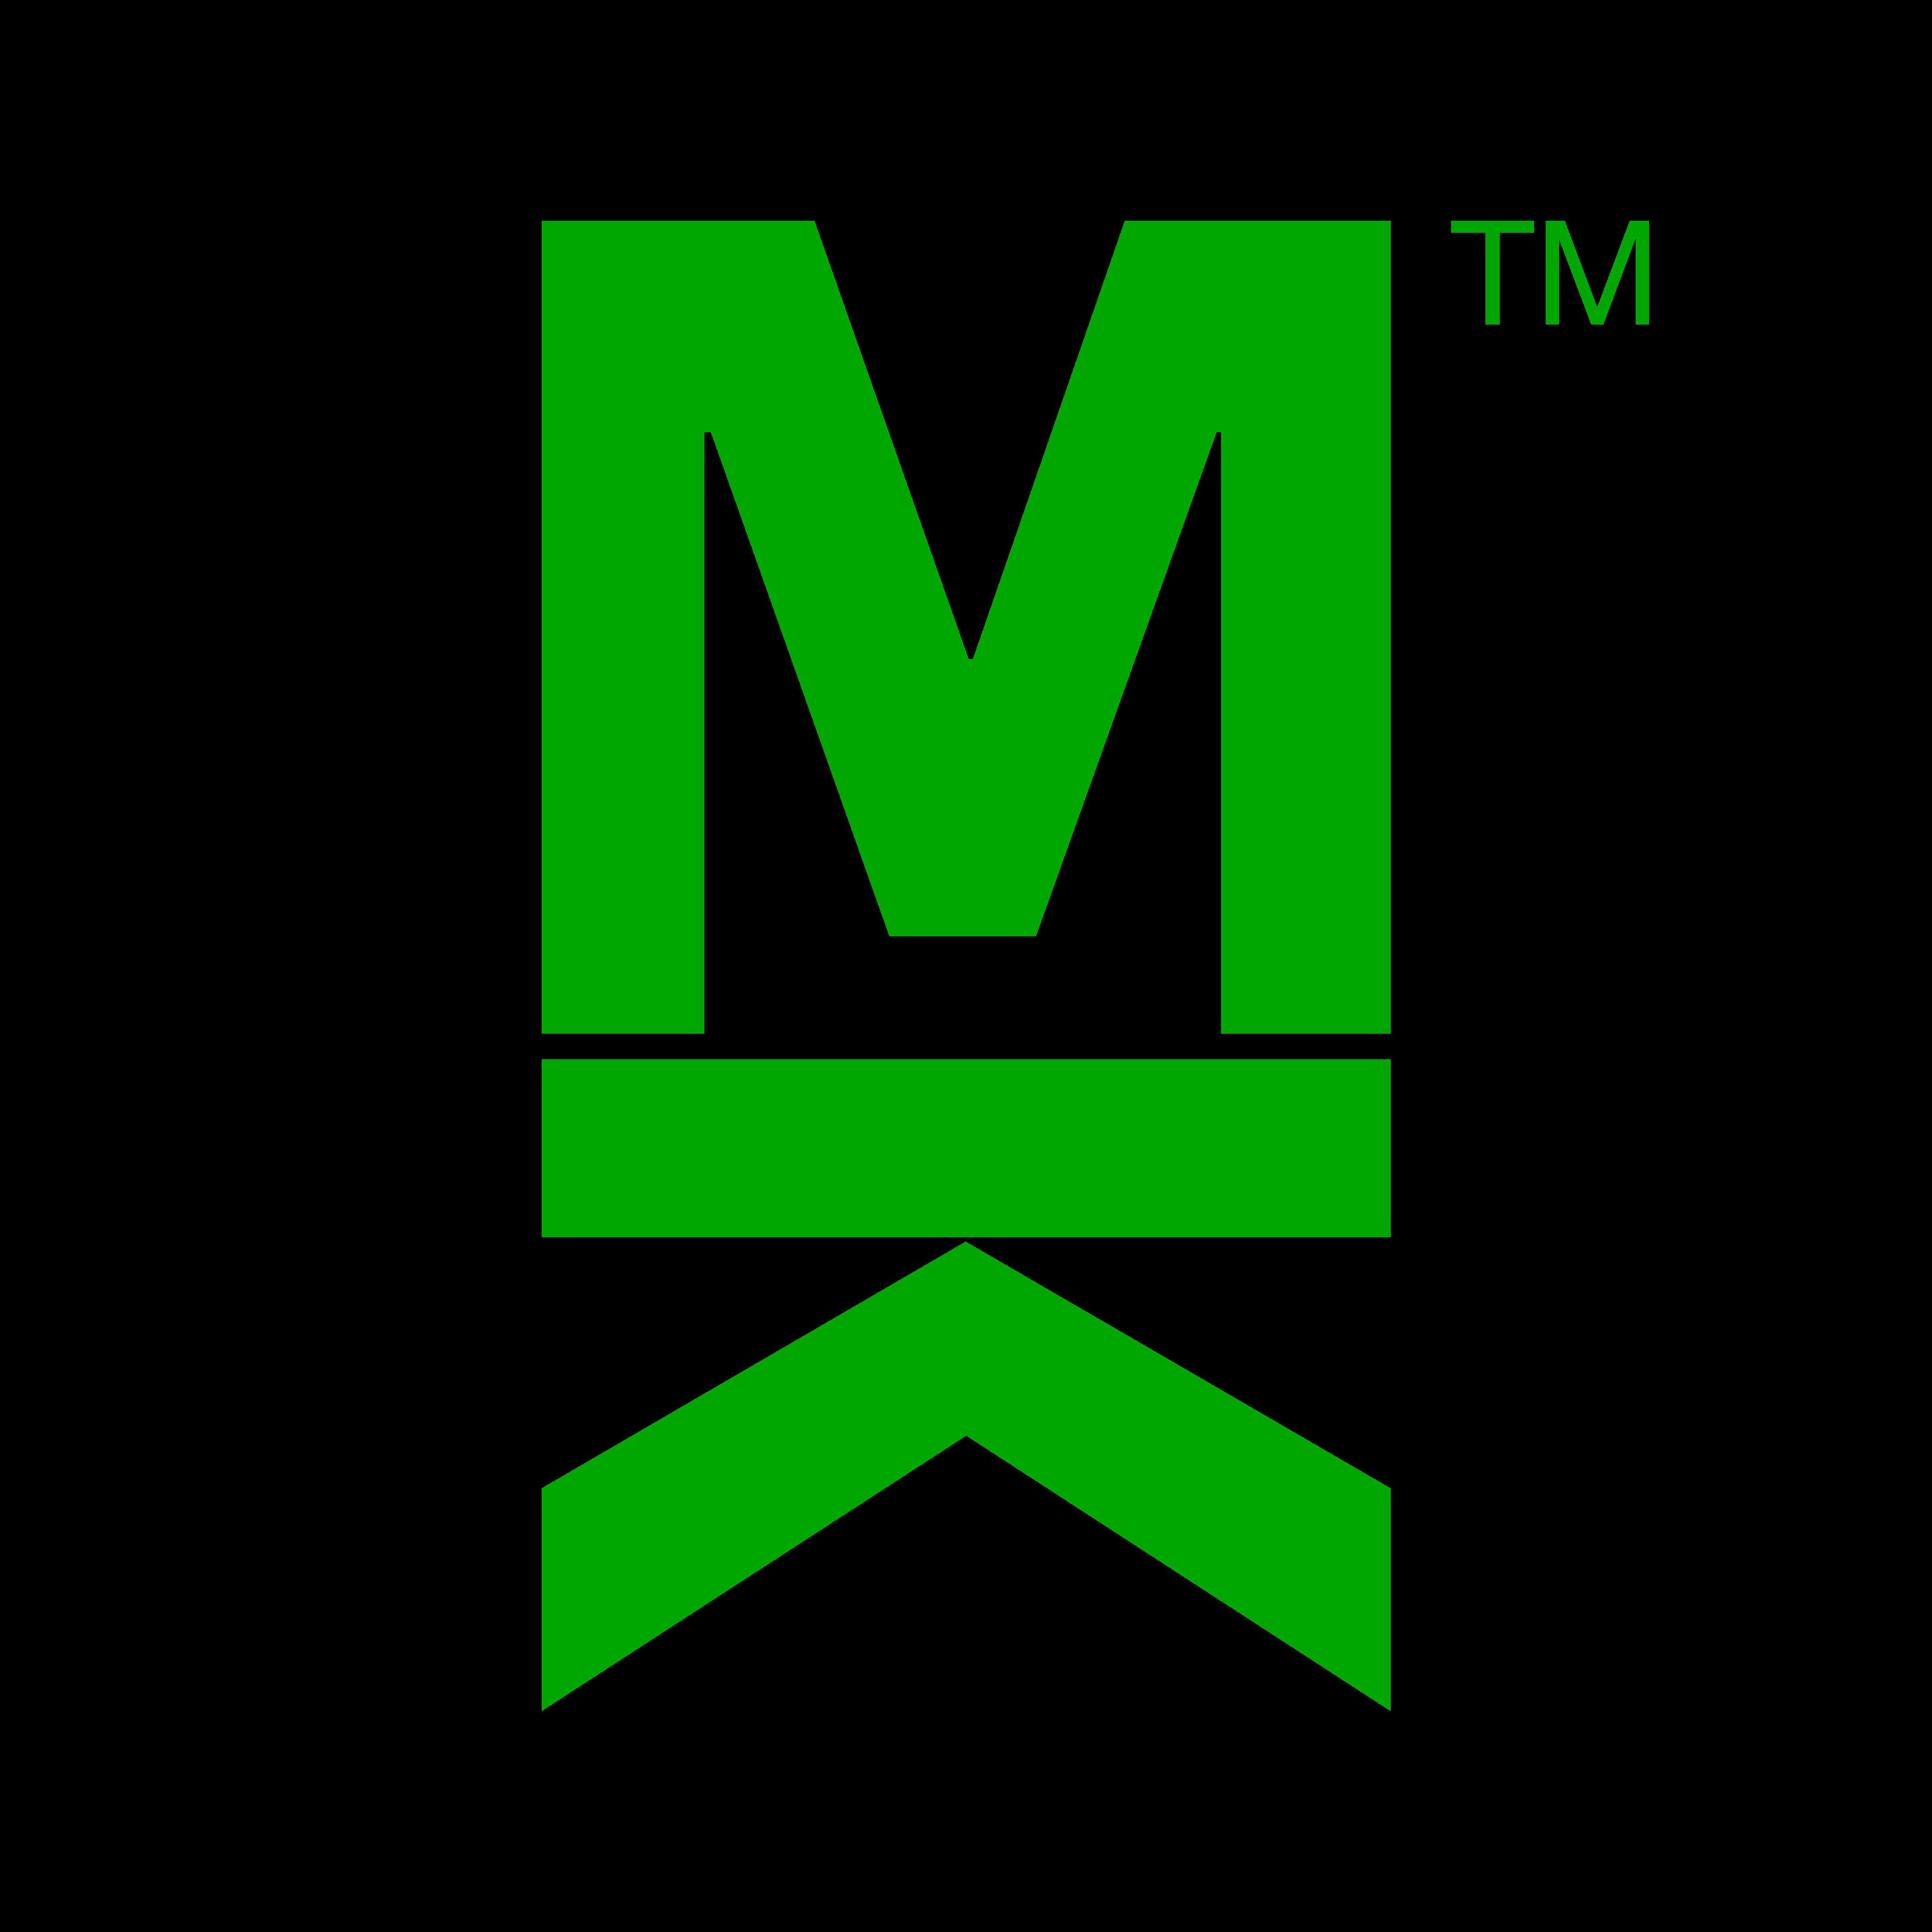 maize kraize logo green